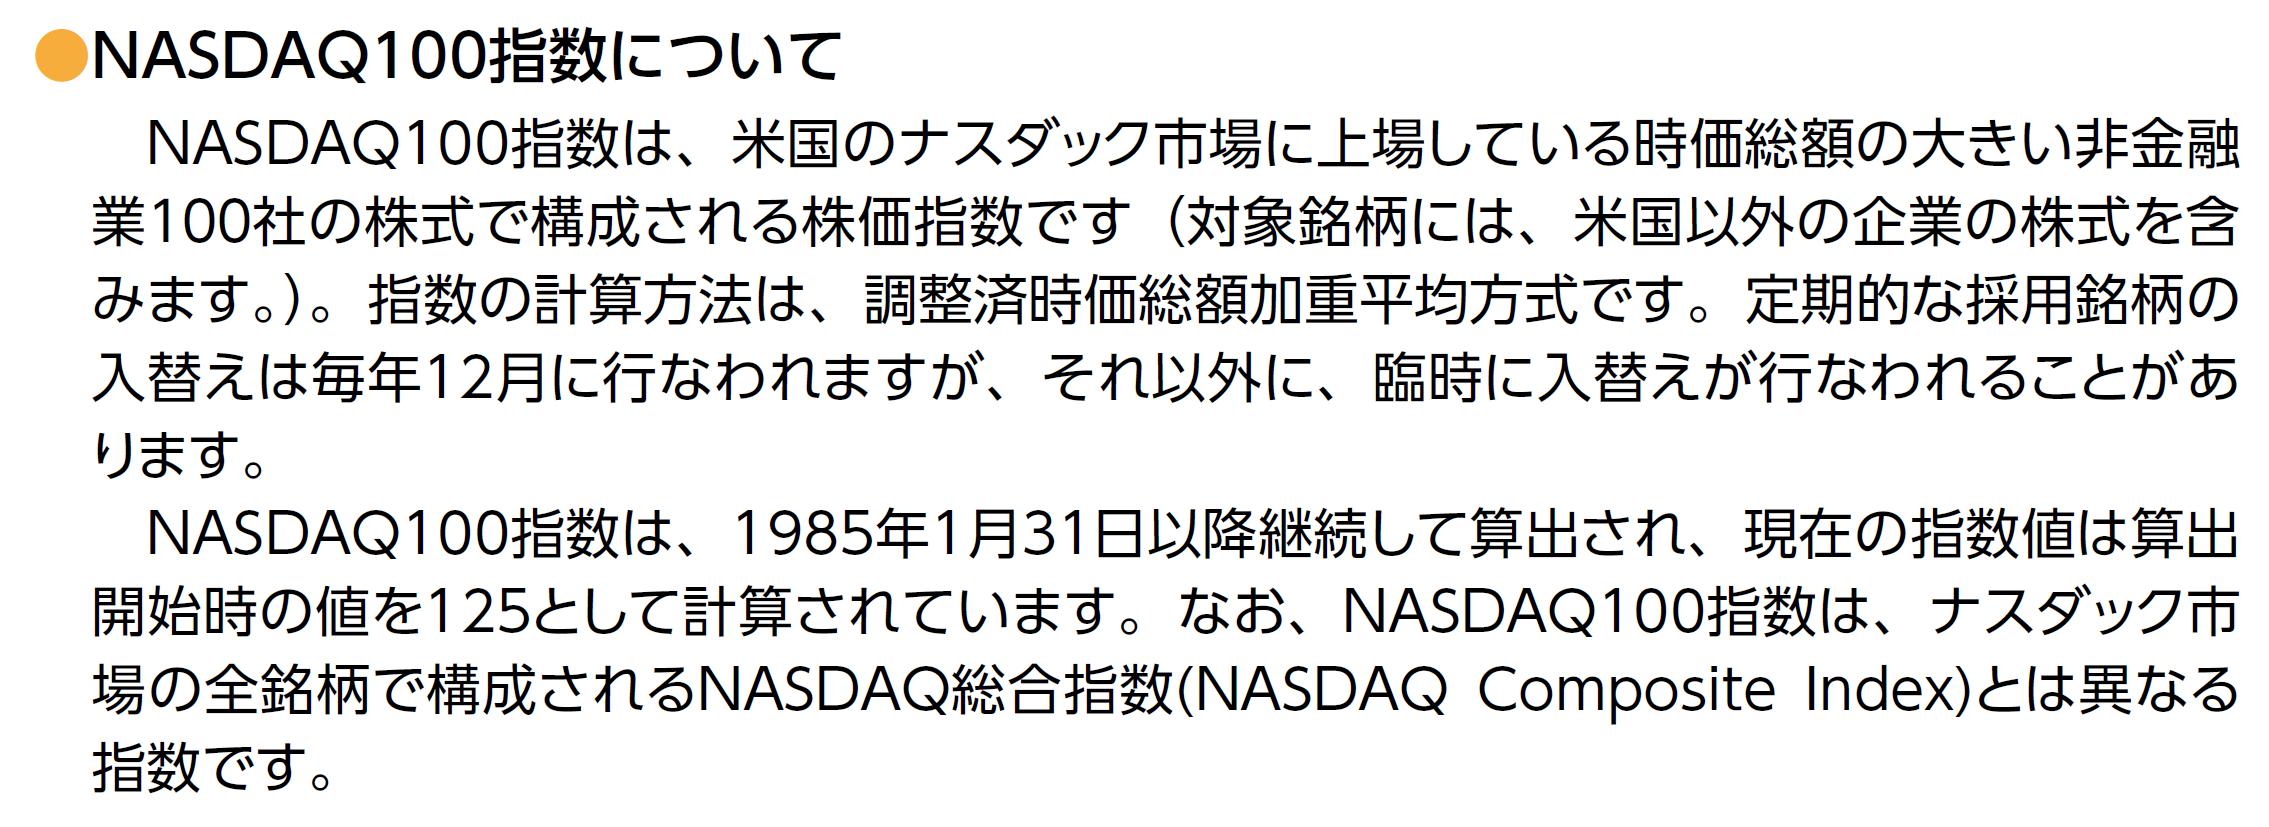 f:id:hodo-work:20201209200235p:plain